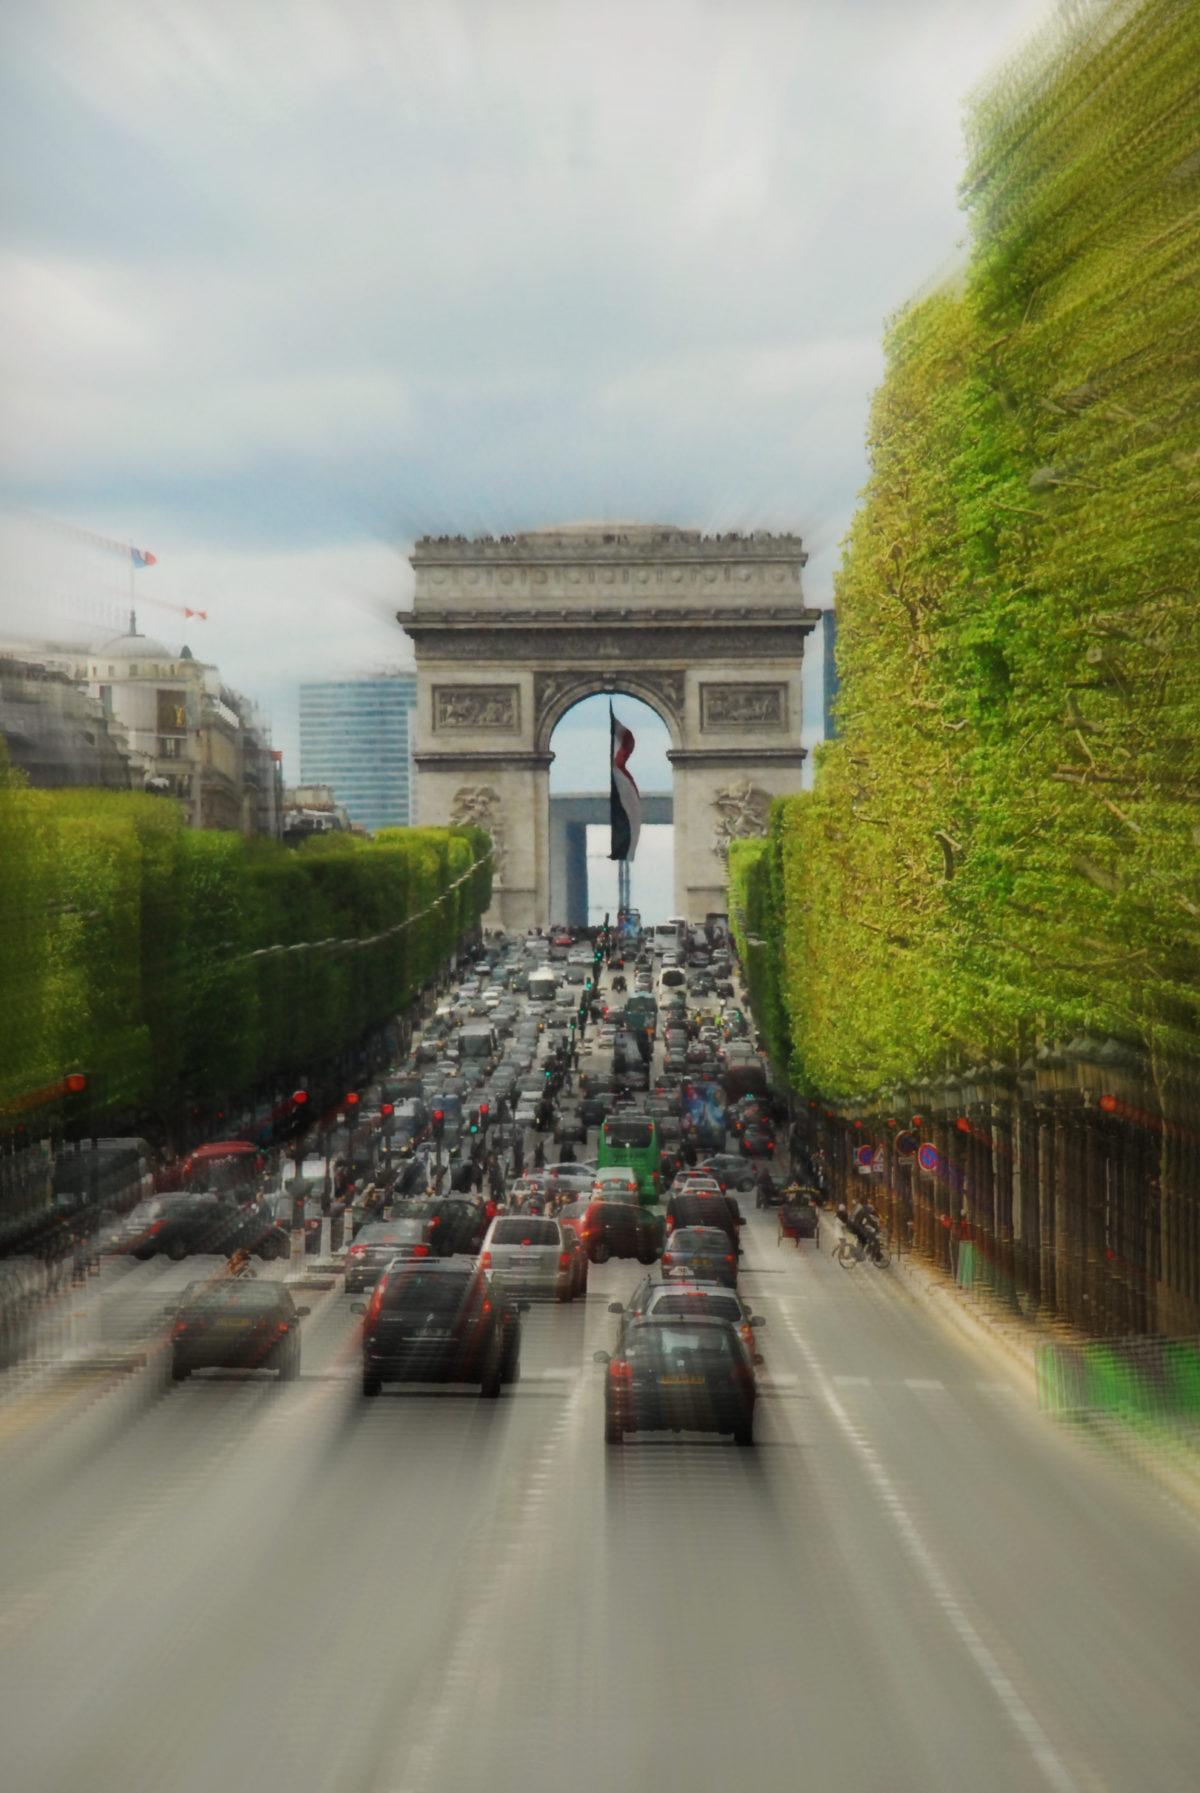 paris-cliches-arrondissement-monsieur-madame-claudia-lully-champs-elysees